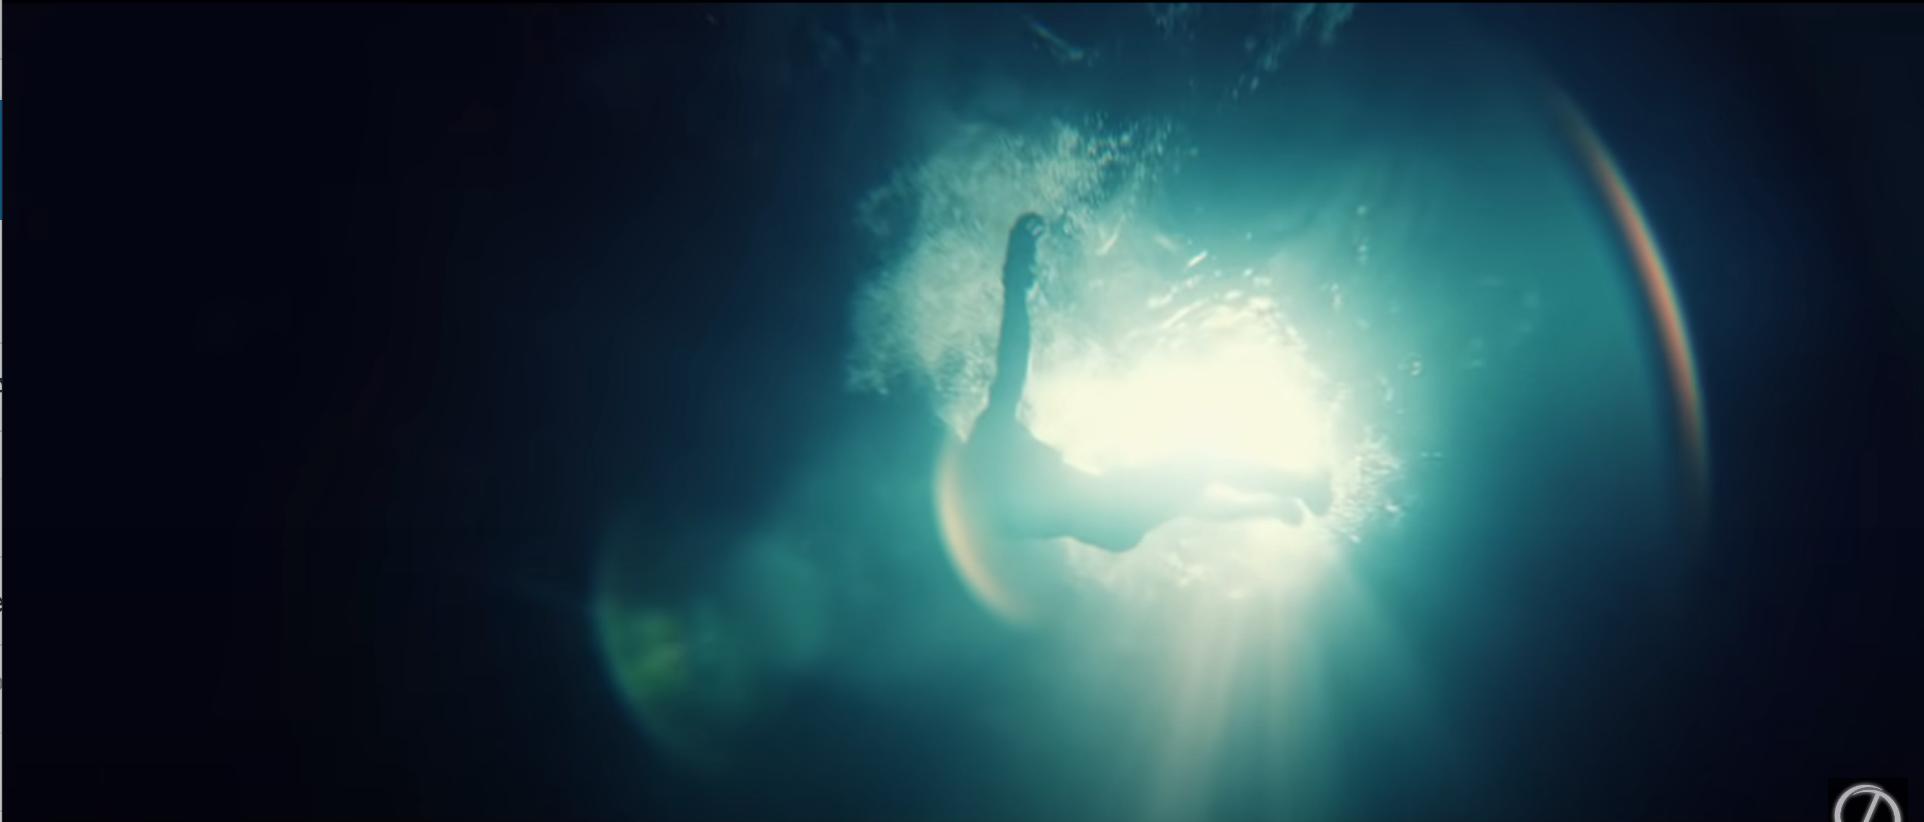 ØMI - ANSWER... SHADOW MV撮影 水中撮影|ジール撮影事業部